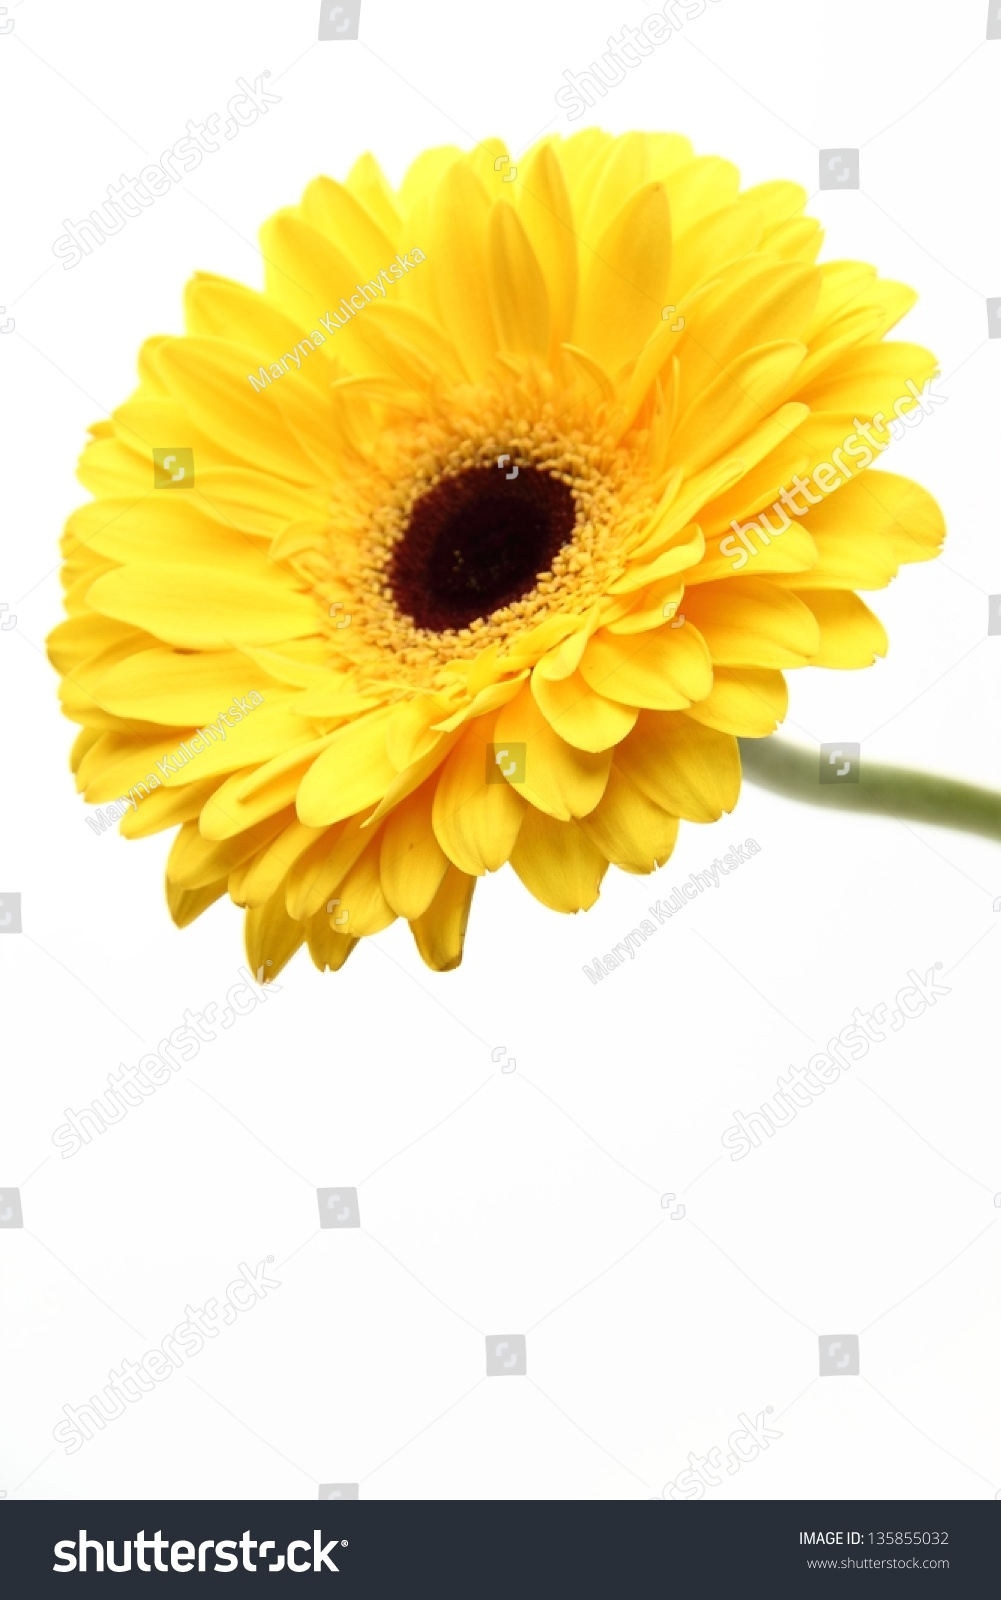 Lovely Single Flower Over White Background Stock Photo Royalty Free